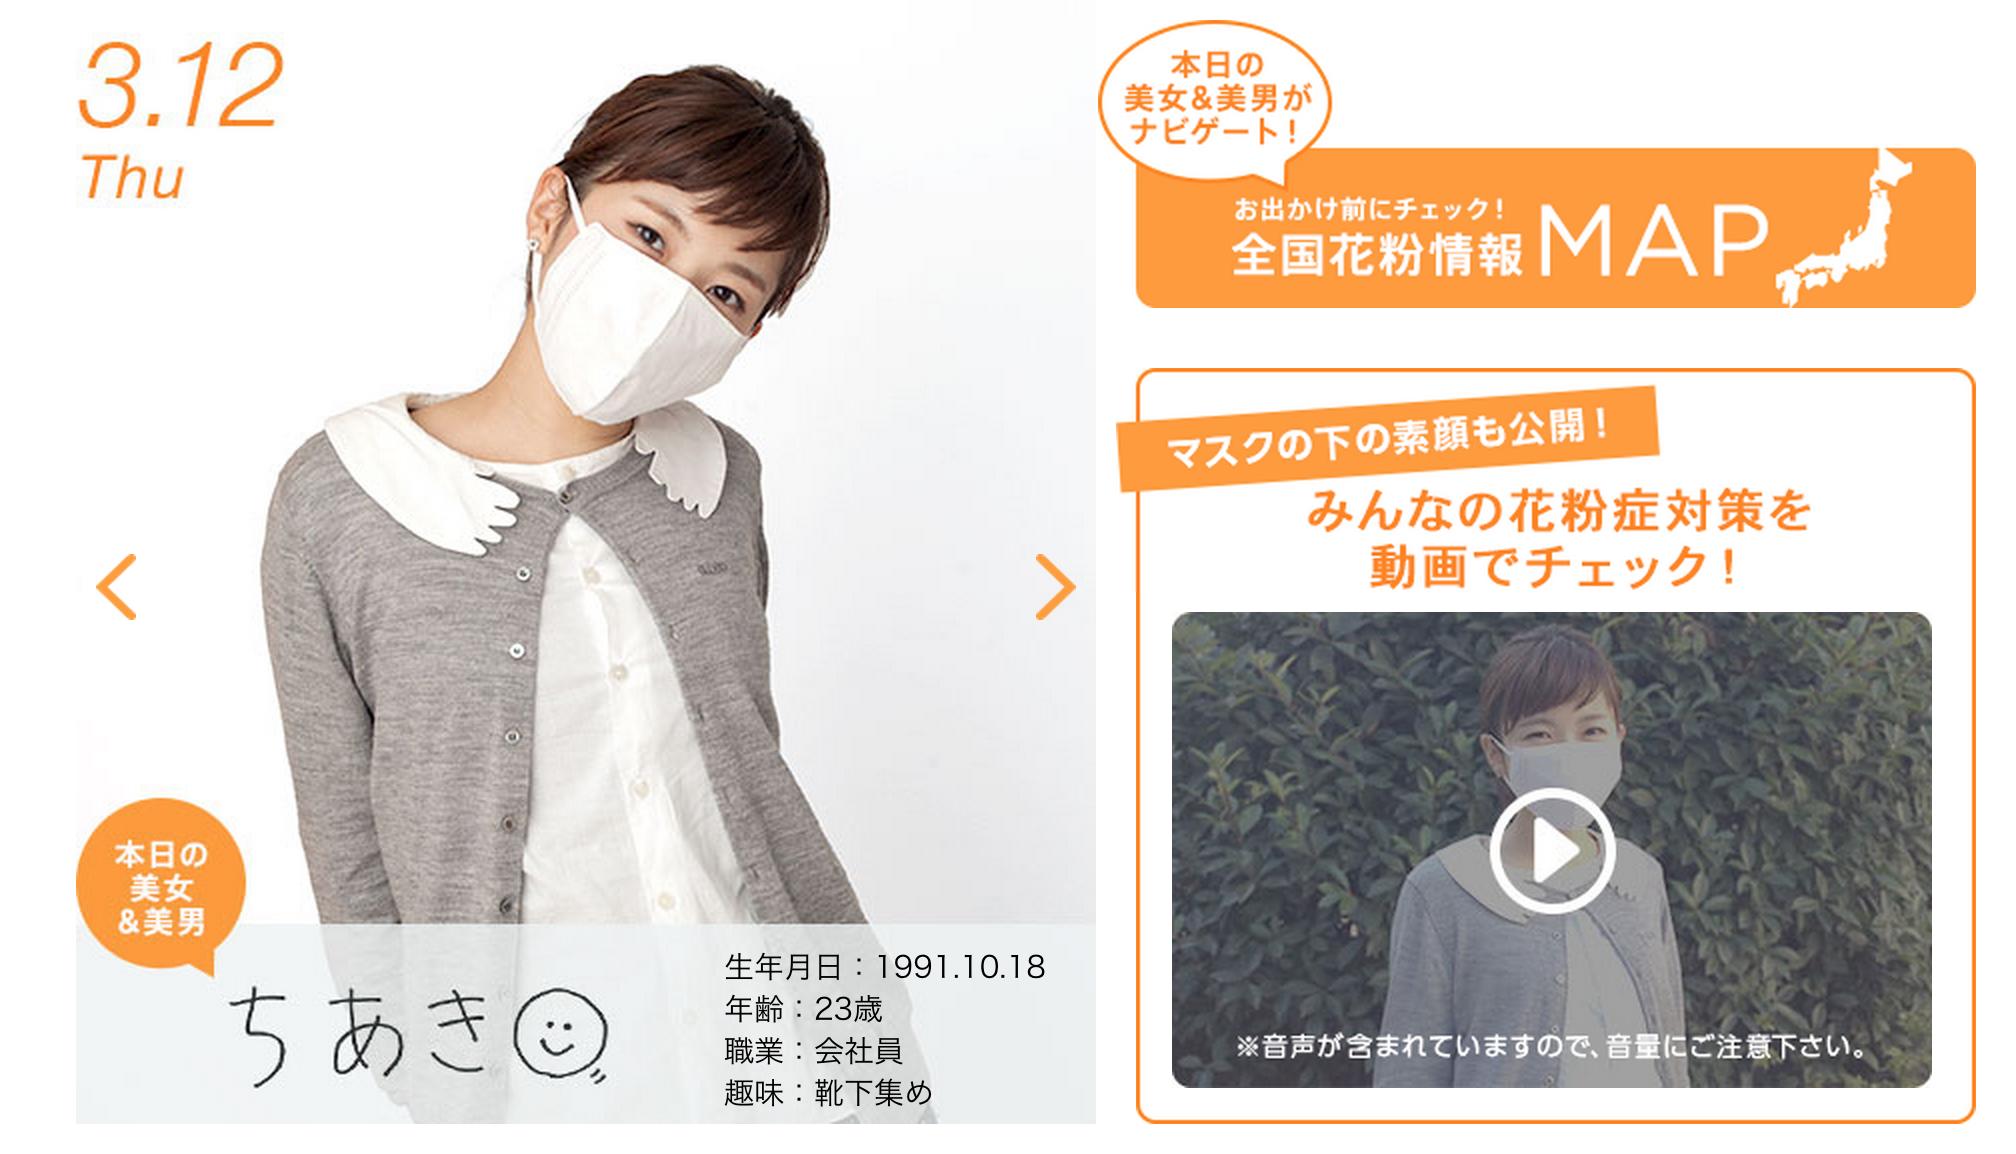 kafun taisaku bijo binan yahoo hay fever pollen allergy website